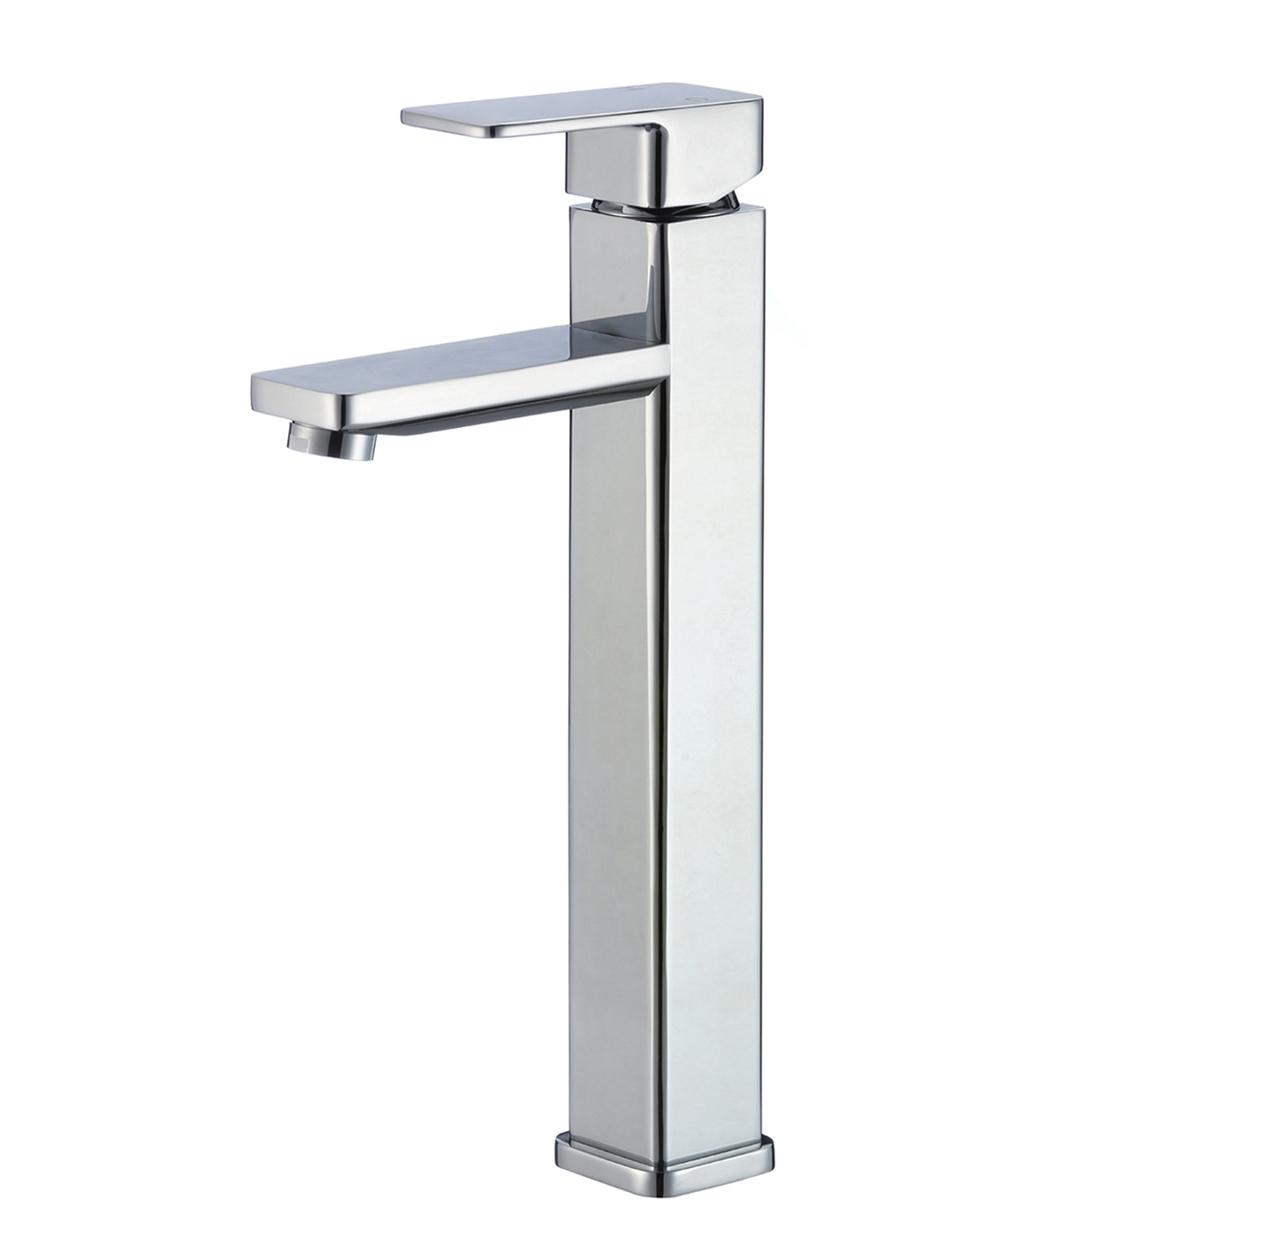 Orleans Single Handle Deck Mounted Bathroom Sink Faucet